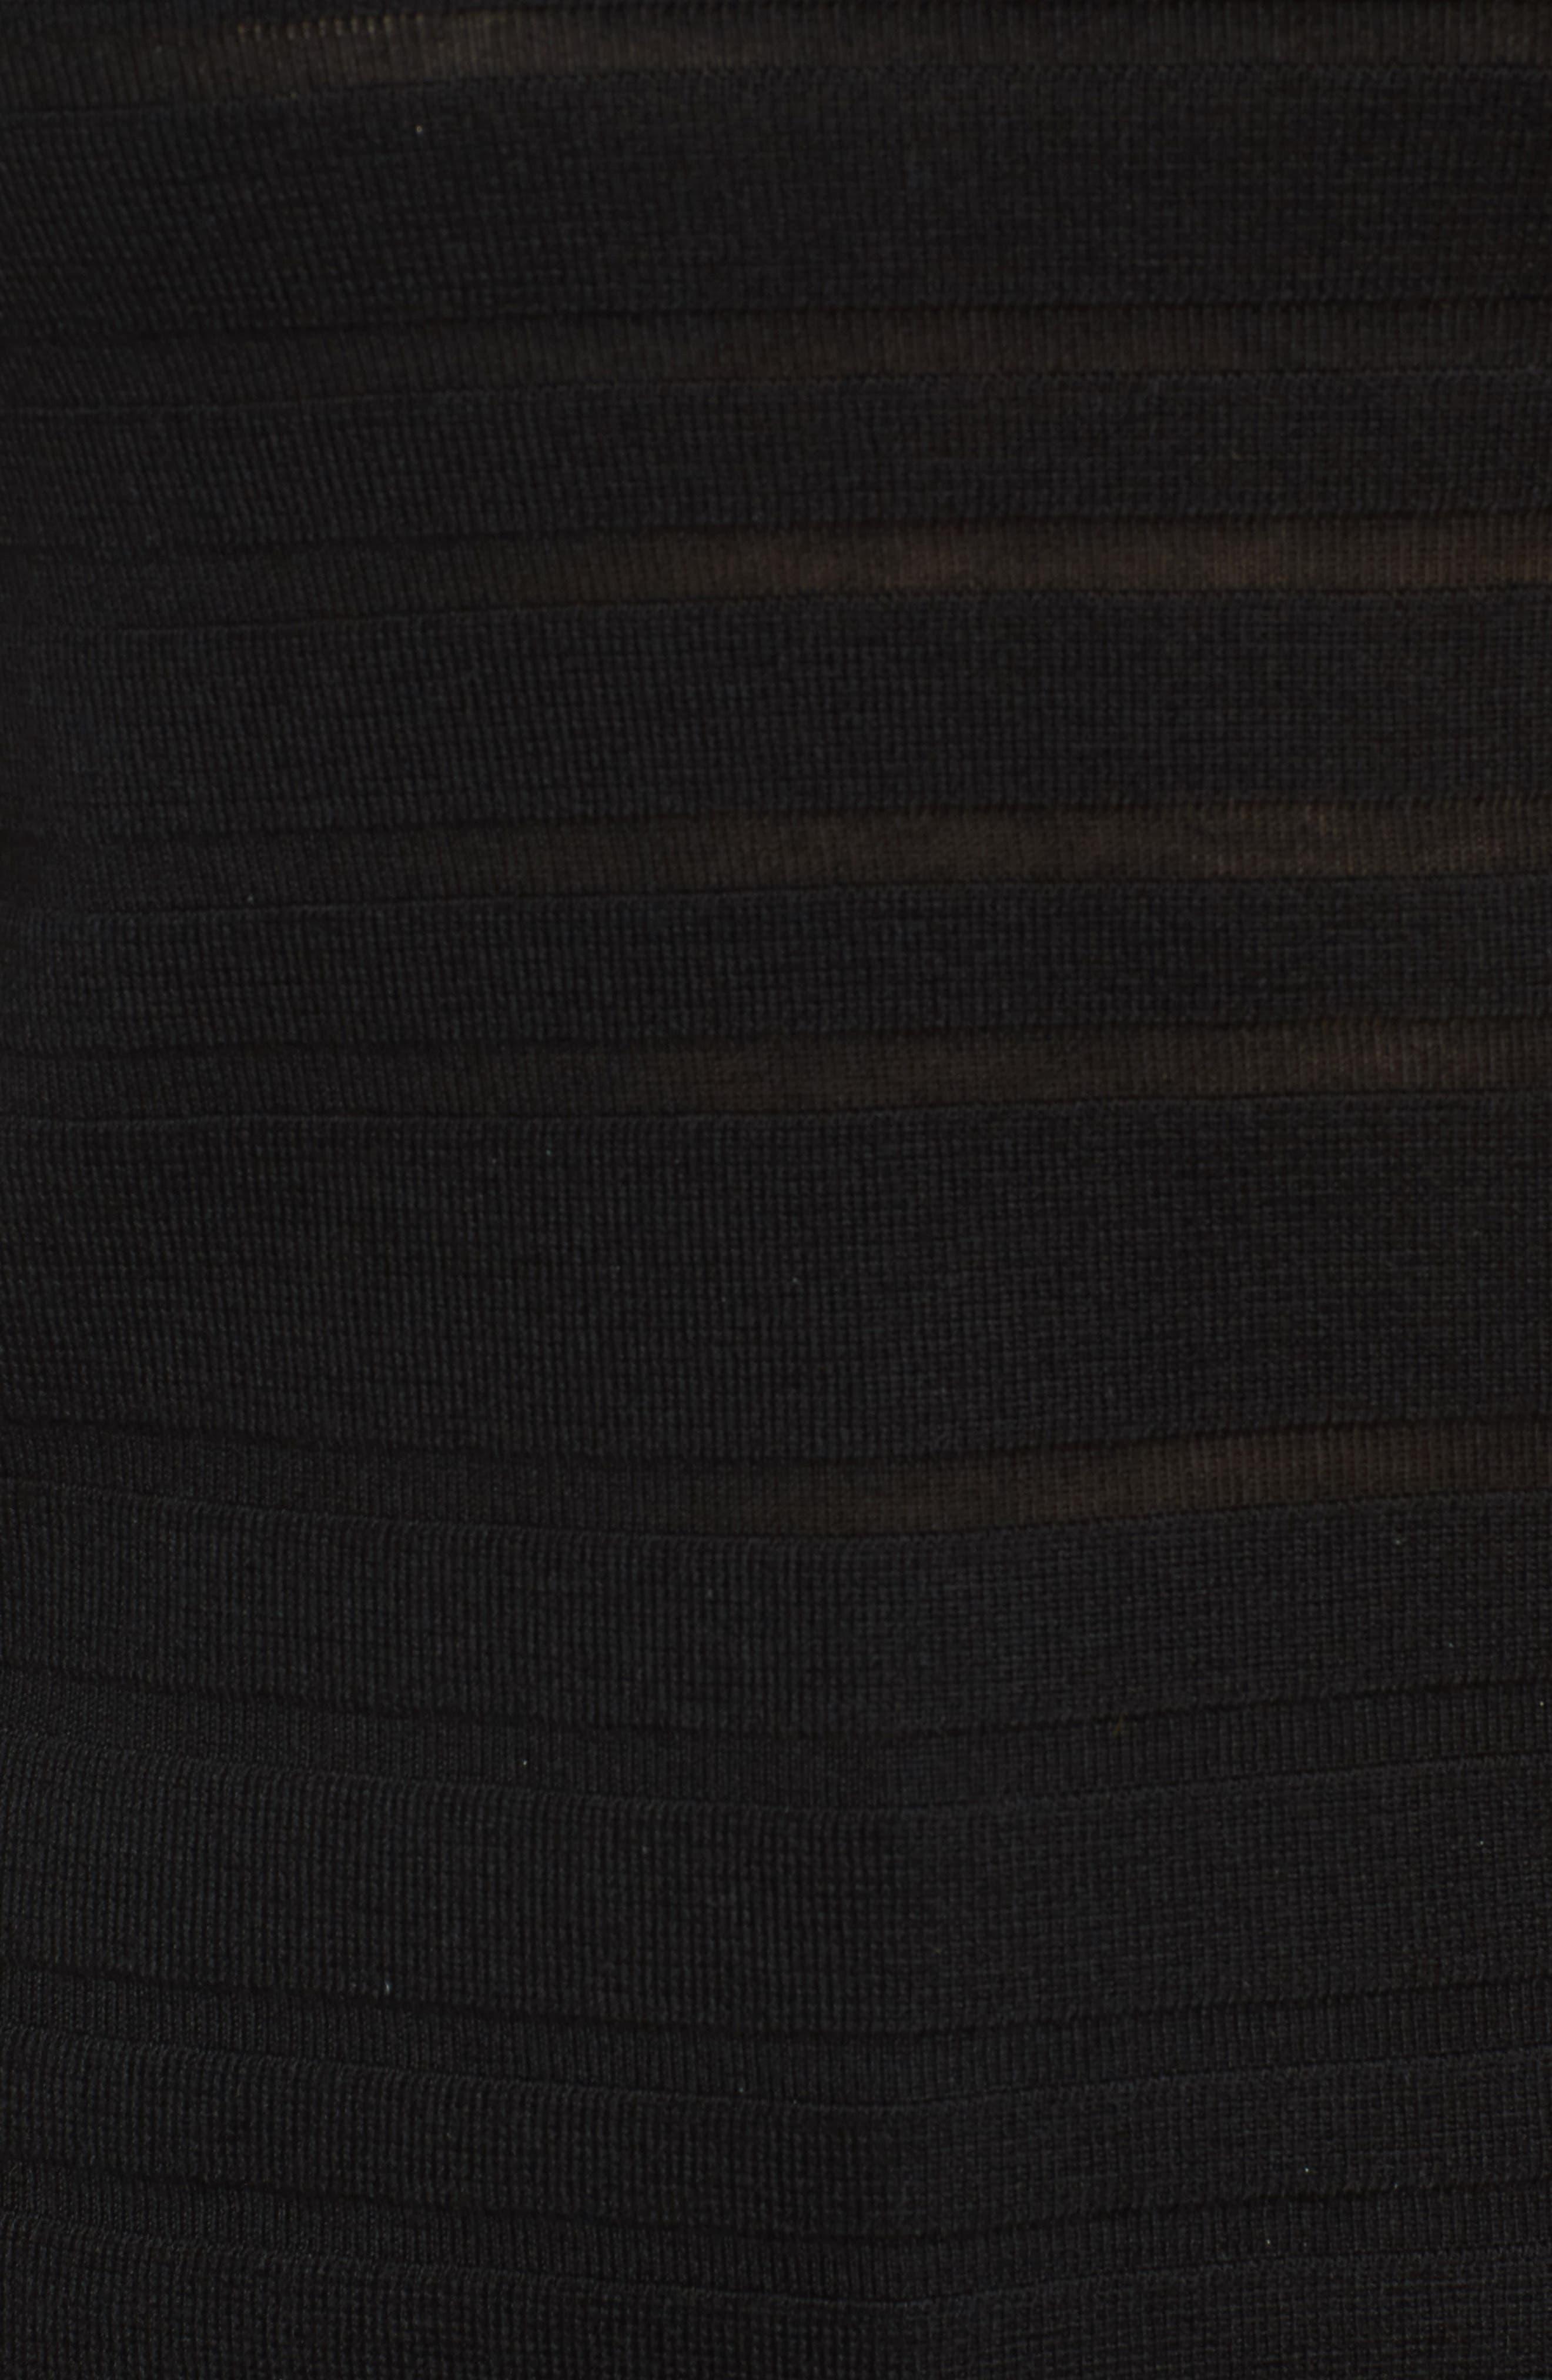 Finea Stripe Textured Wool Sweater,                             Alternate thumbnail 9, color,